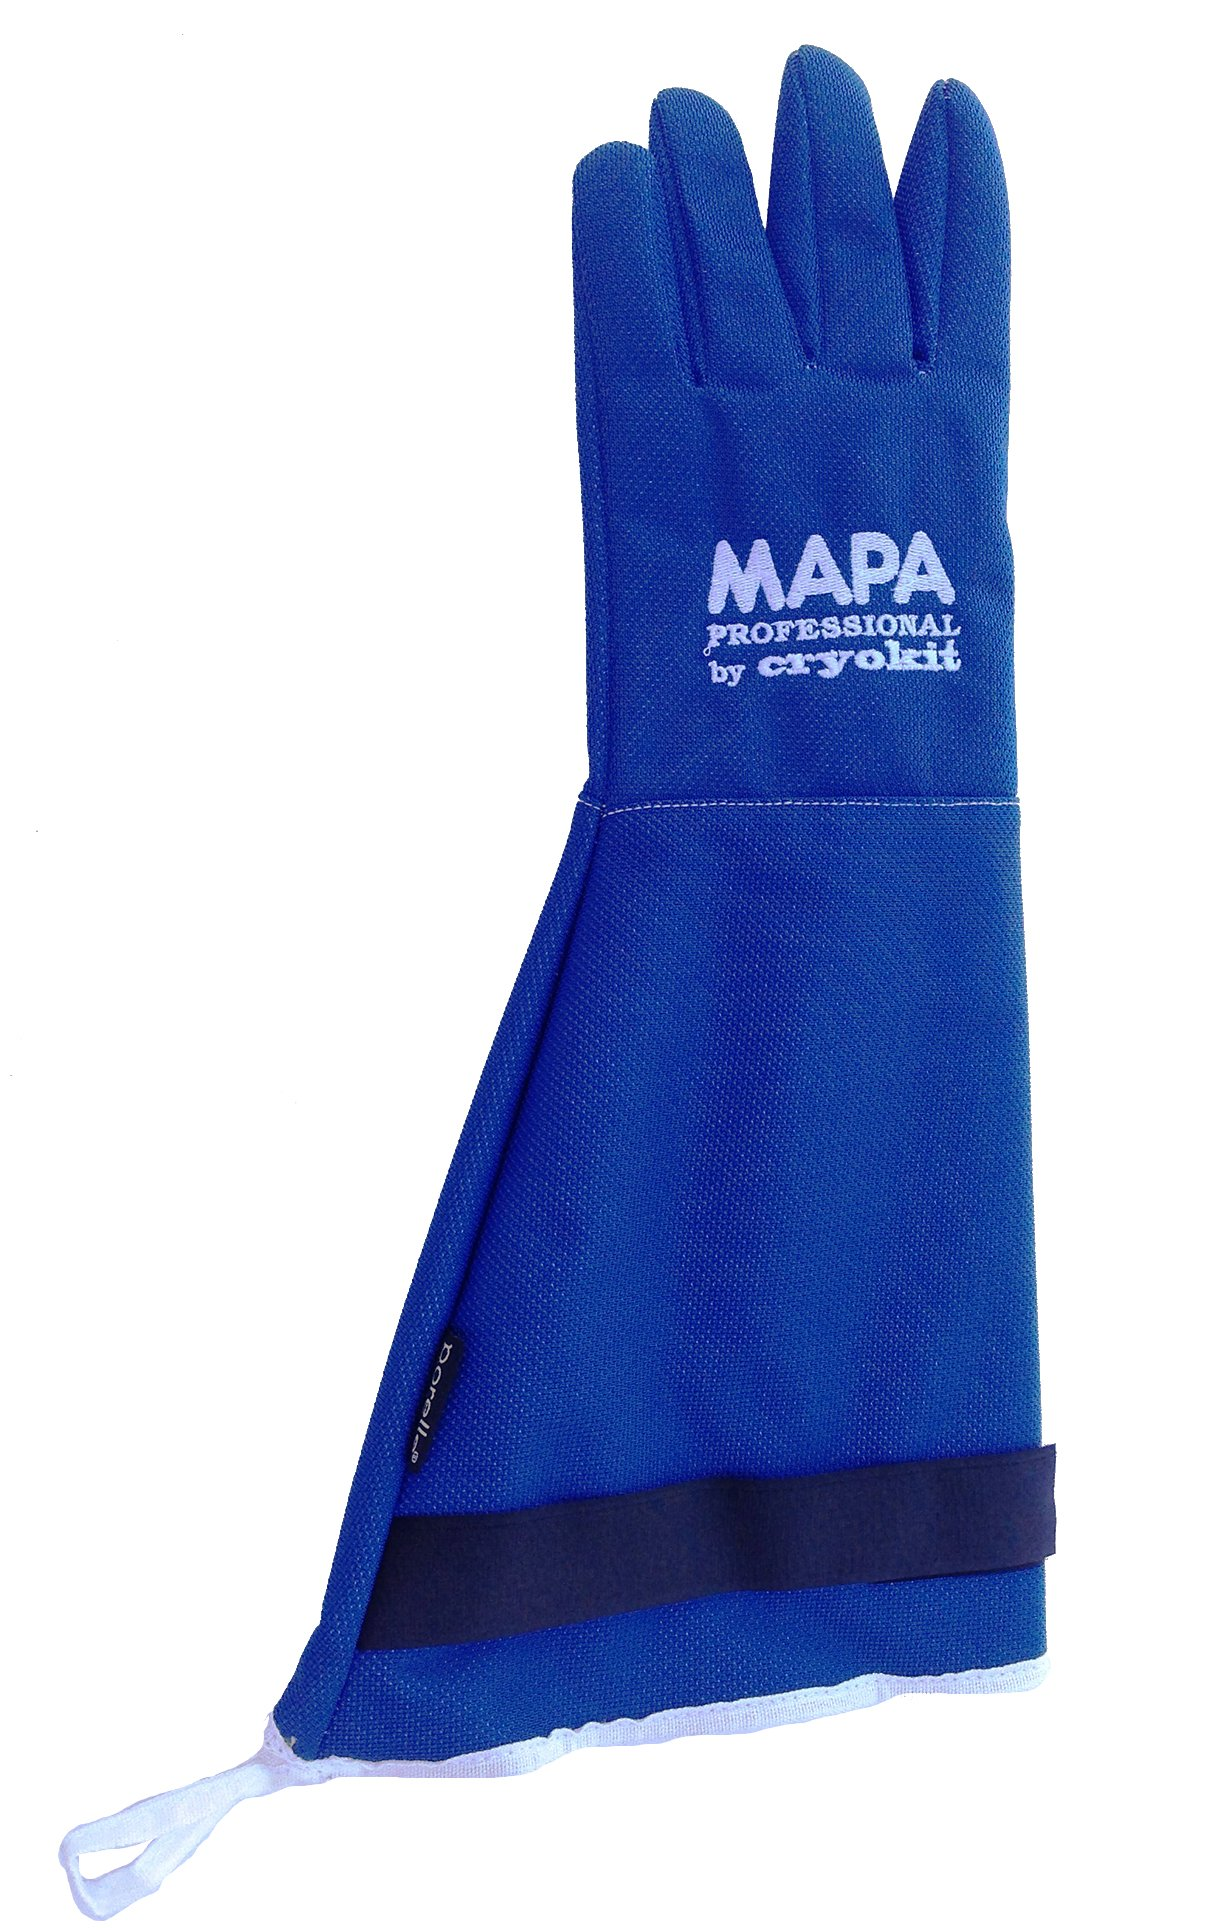 MAPA Professional CRYPLS214508 CRYOPLUS-2.1 45 Cryogenic Glove, (18''-Ma), Size 8, PR 1, Blue